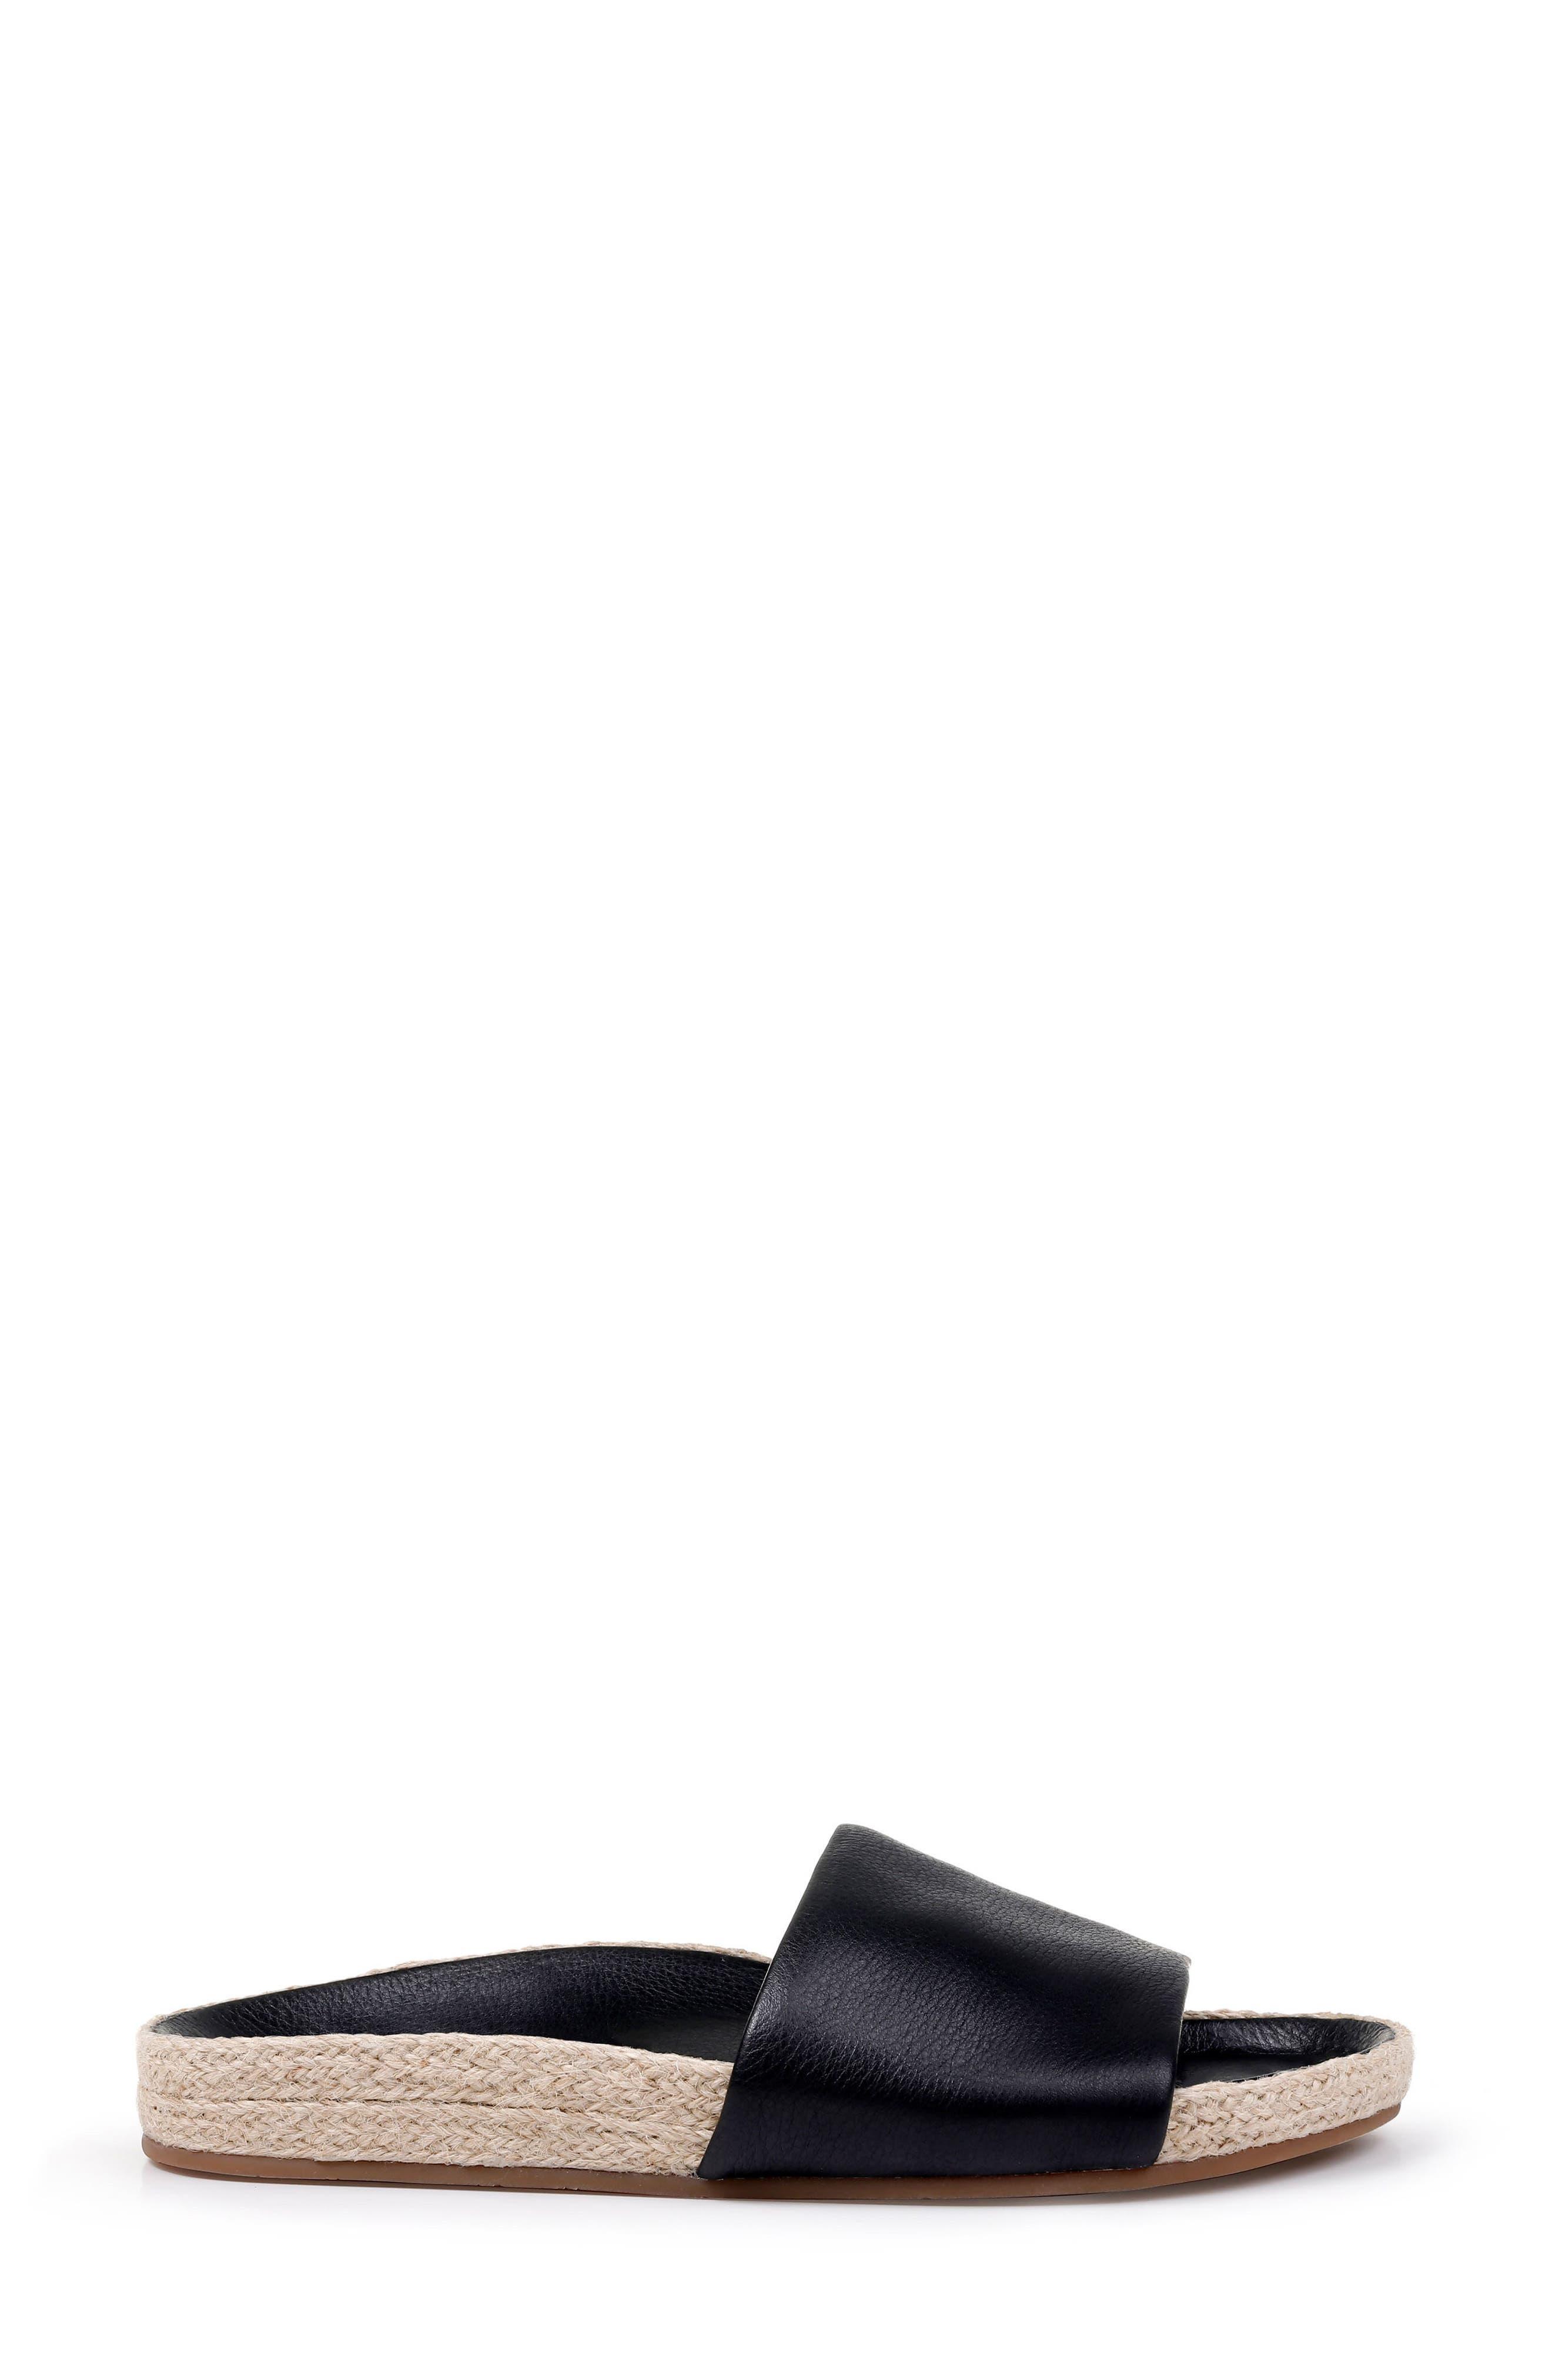 SPLENDID, Sandford Espadrille Slide Sandal, Alternate thumbnail 3, color, BLACK LEATHER